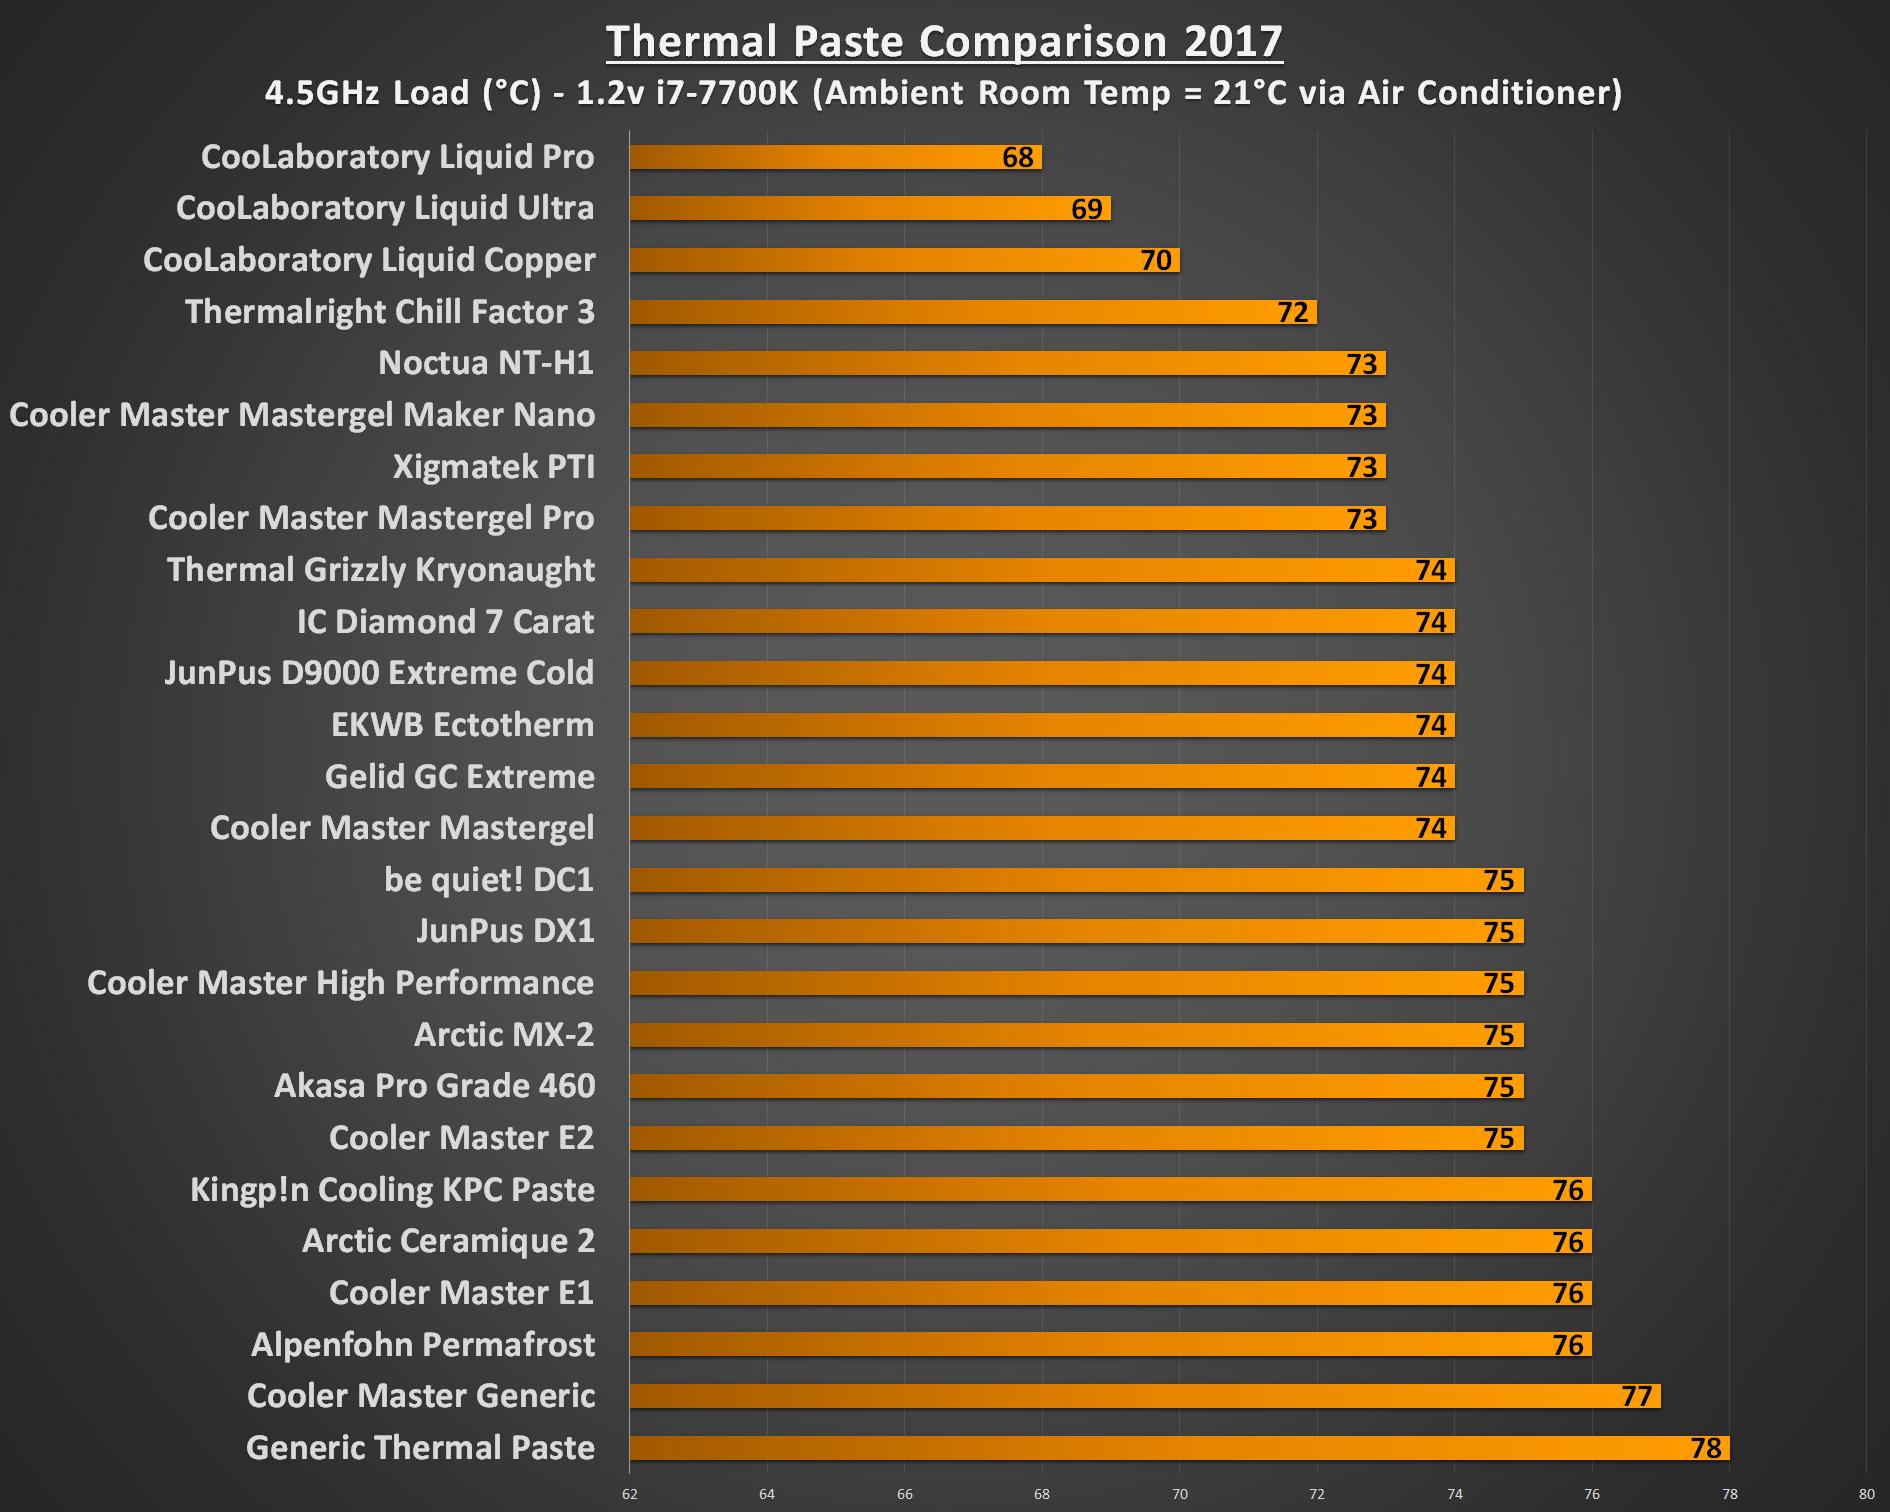 thermal paste comparison pastes 5ghz play3r igen kylpasta i7 comparing cooling tested